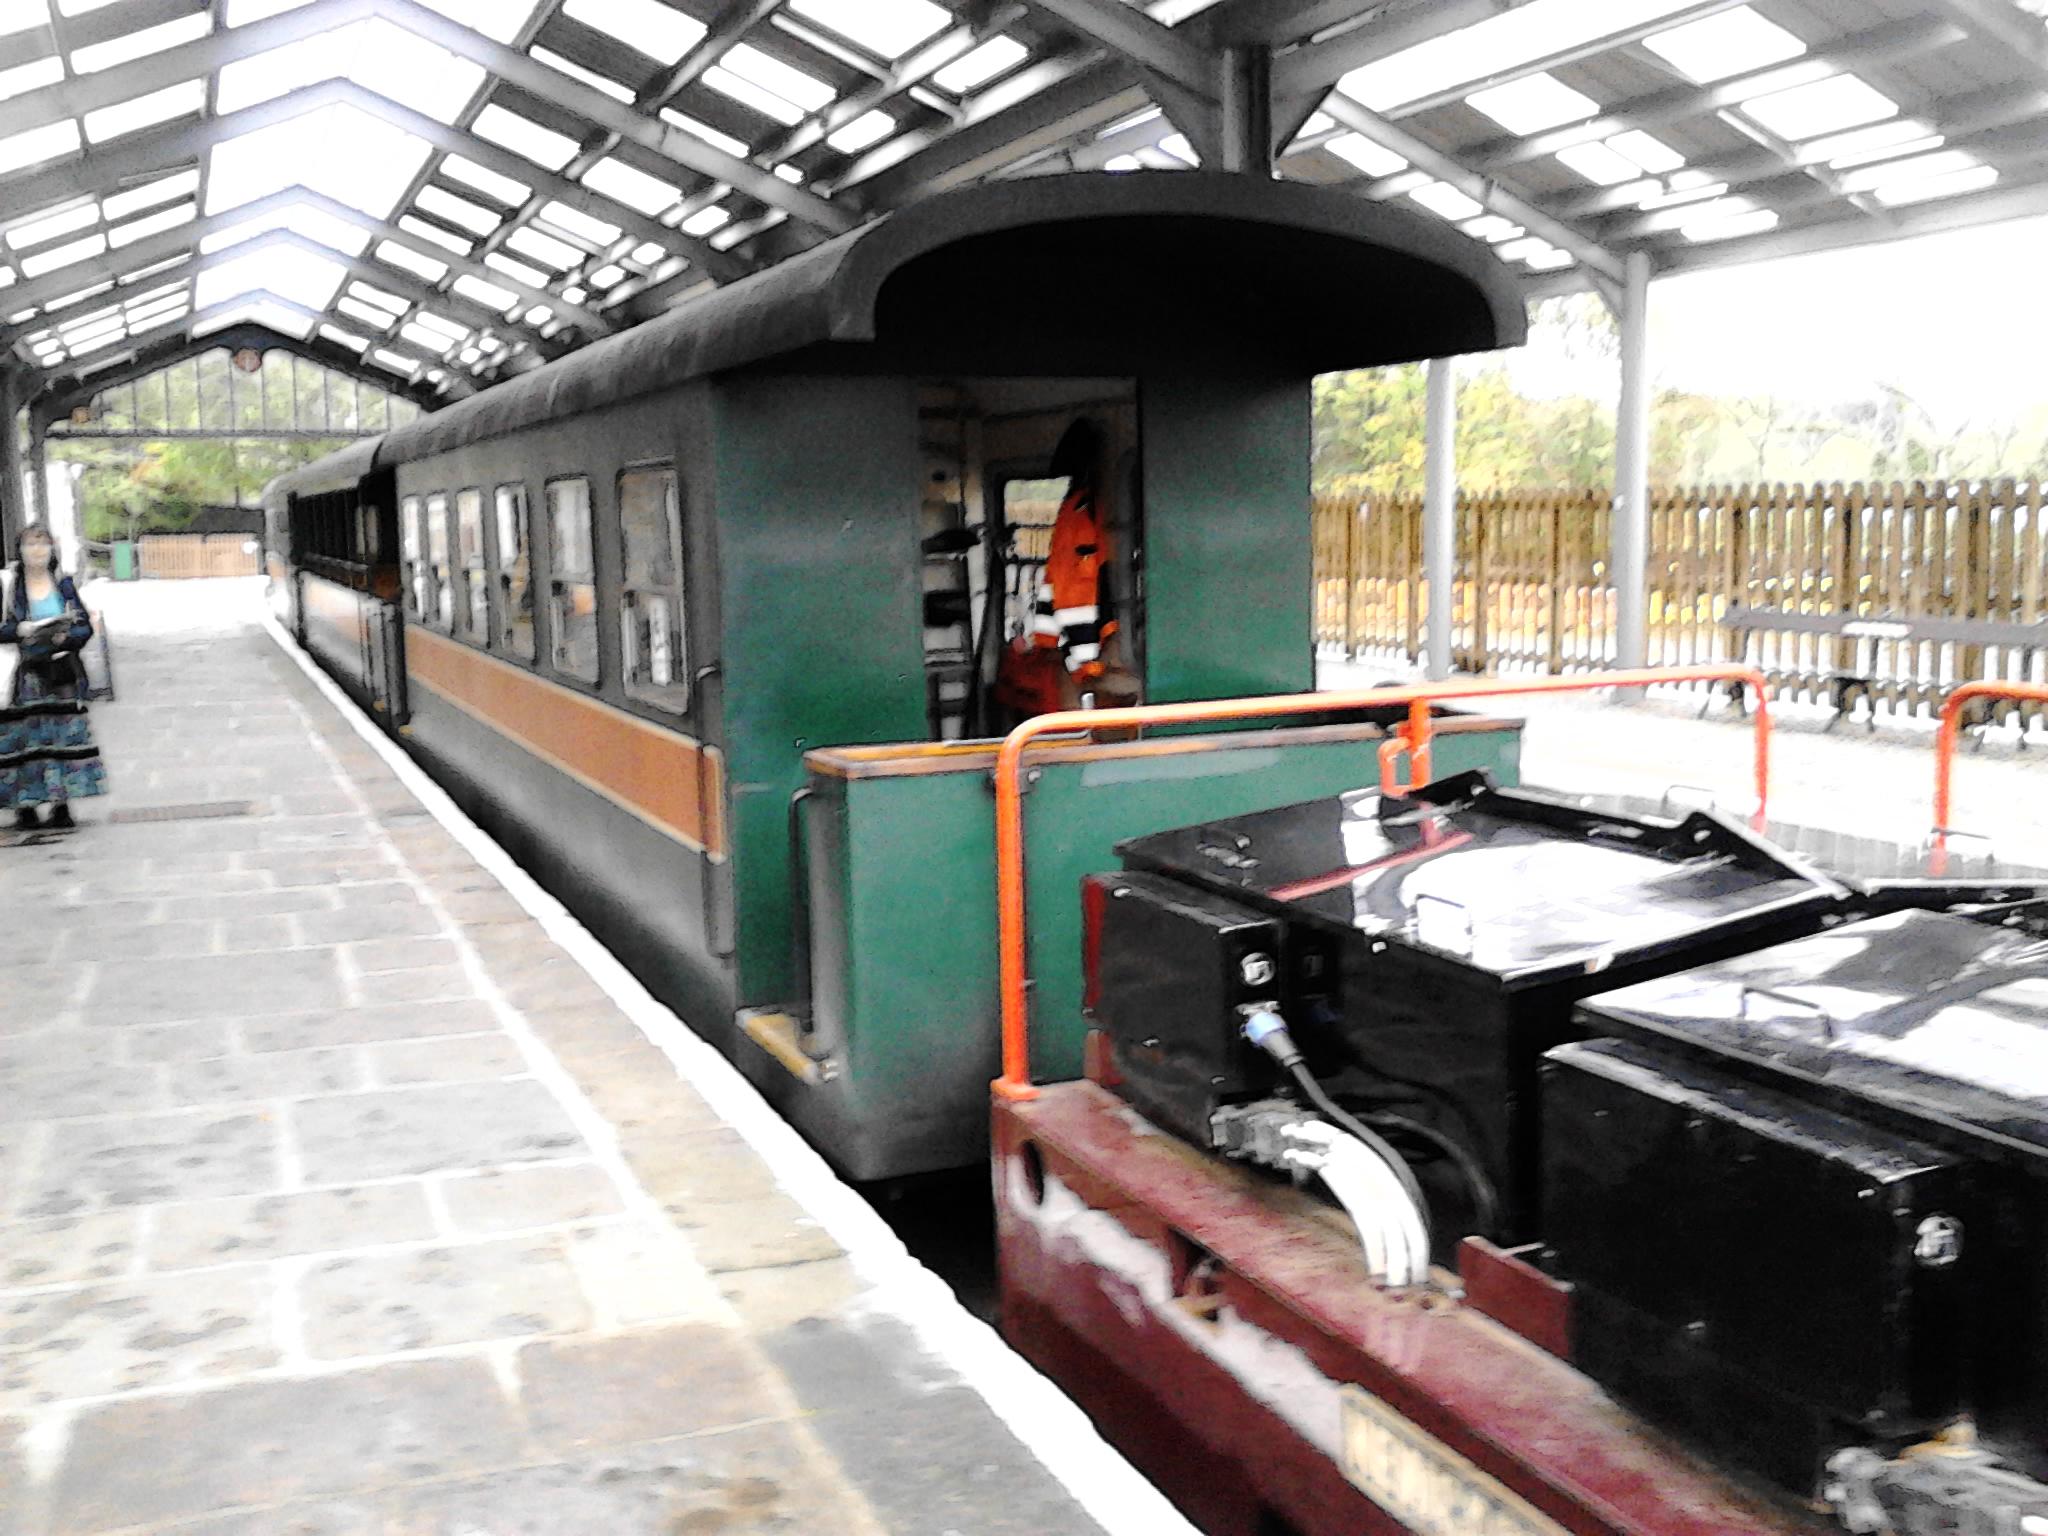 Alston Station